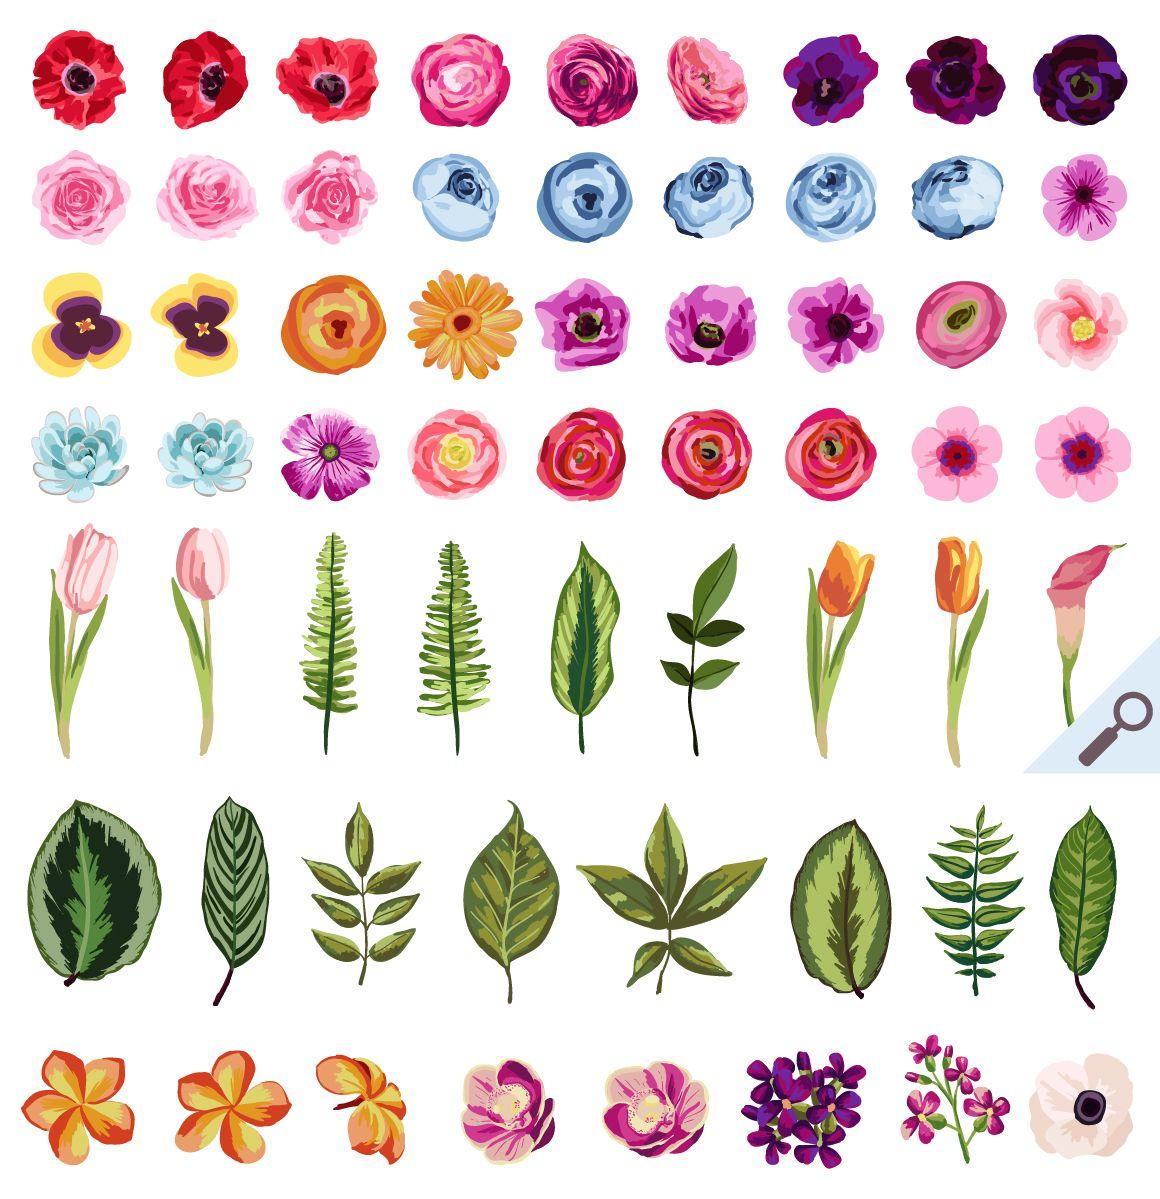 DIY Flower Pack Vol.1 Illustrations 2. Cute Watercolor